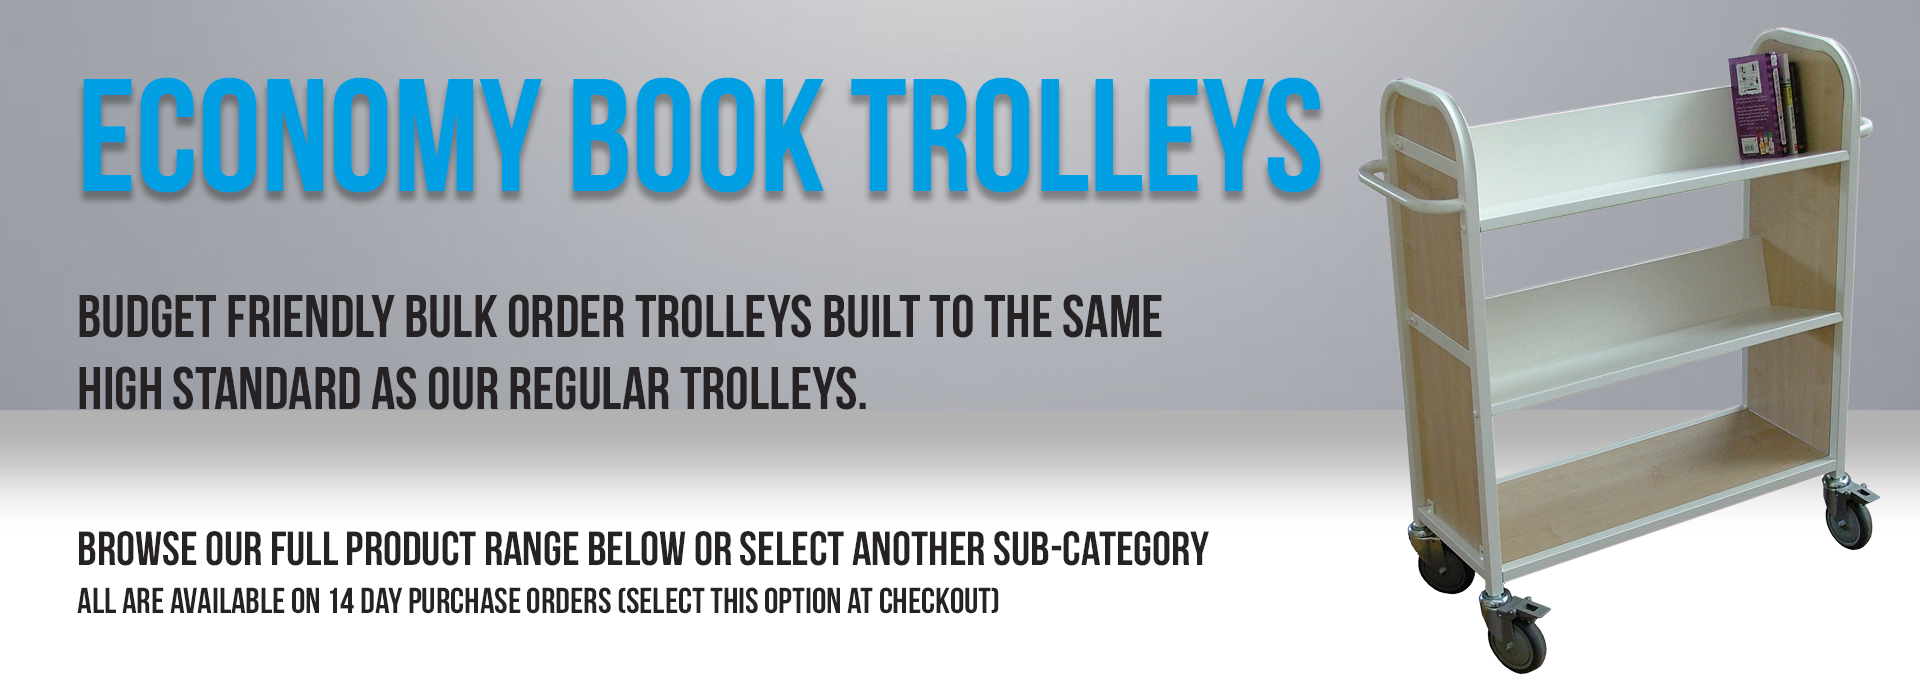 economy-book-trolley-banner.jpg